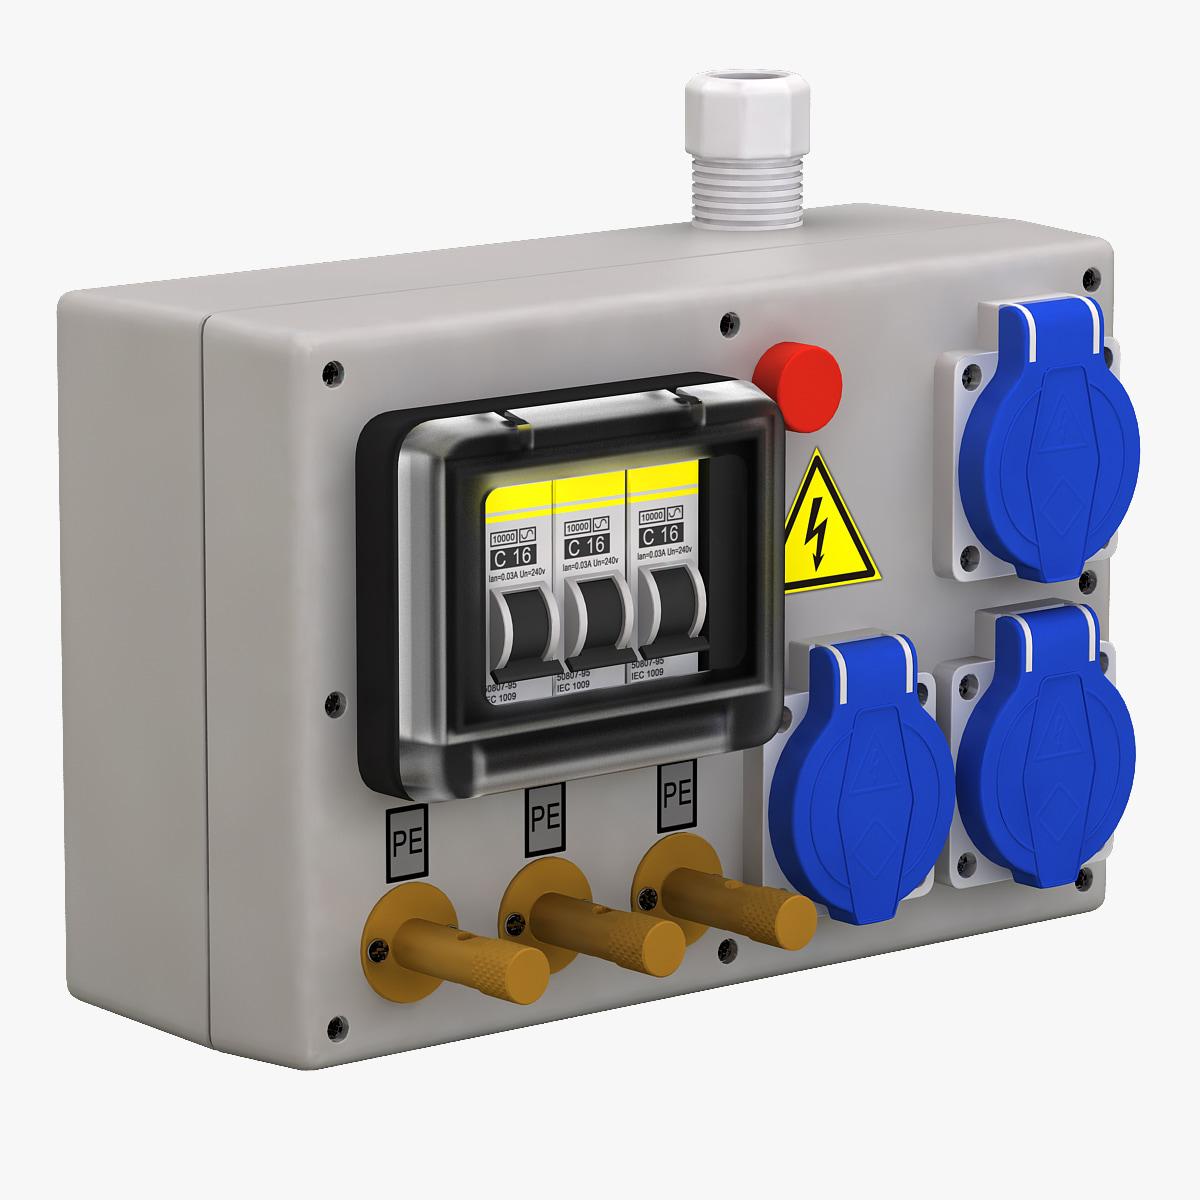 Electrical_Panel_Board_000.jpg